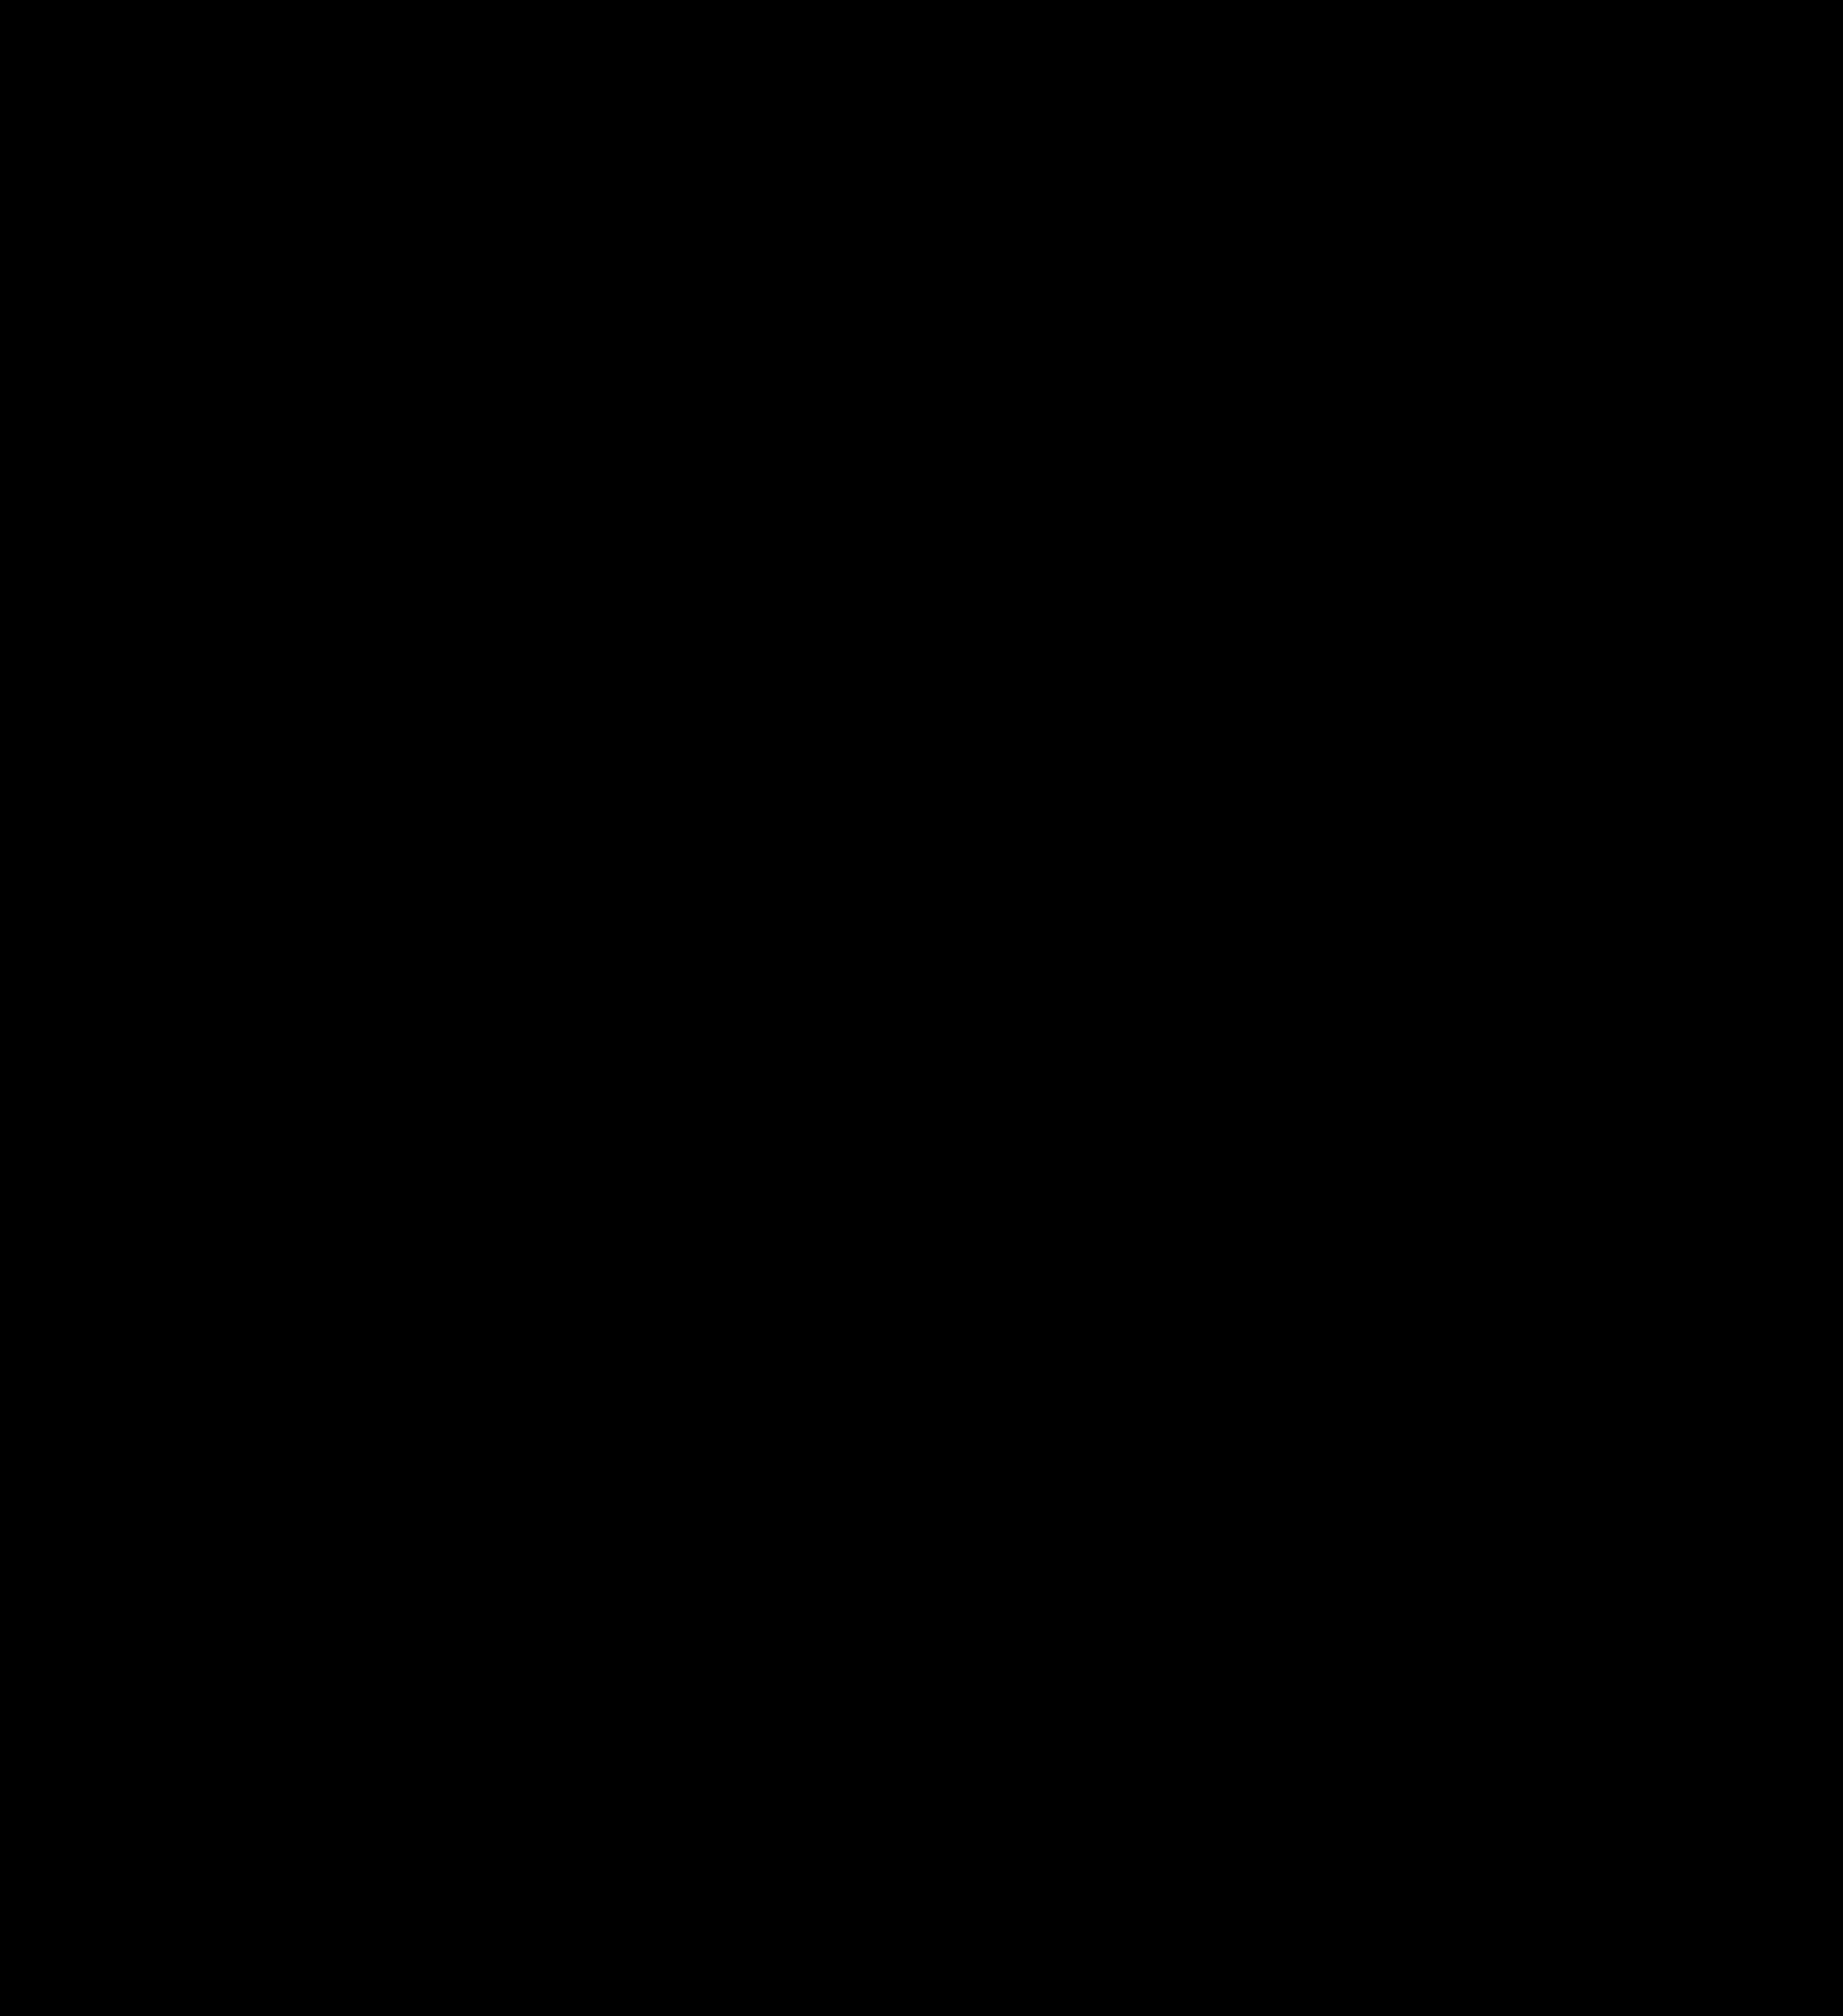 2194x2400 Clipart